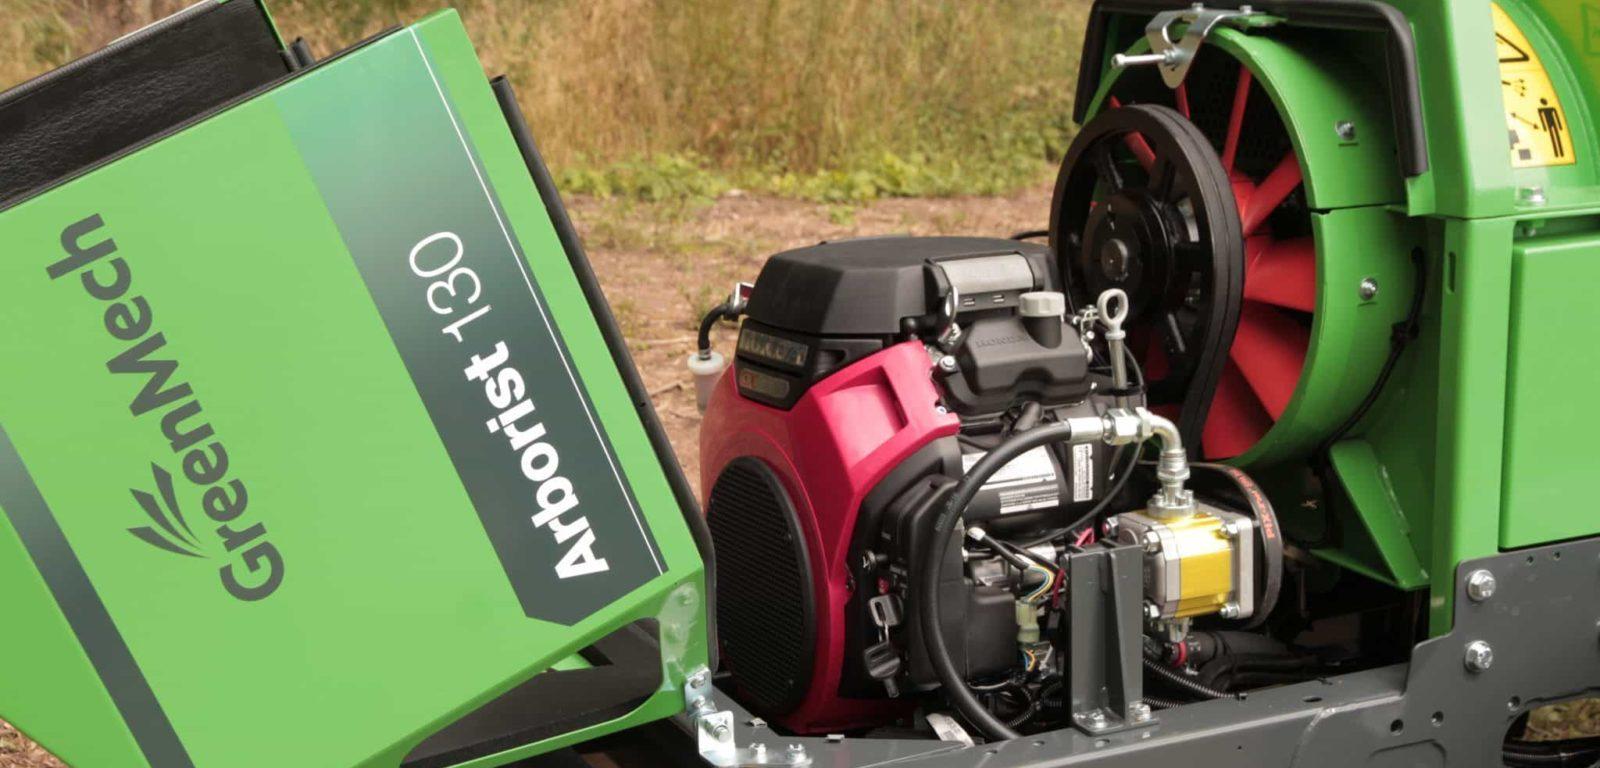 moteur Arborist130 broyeur compact greenmech en vente chez nova paca